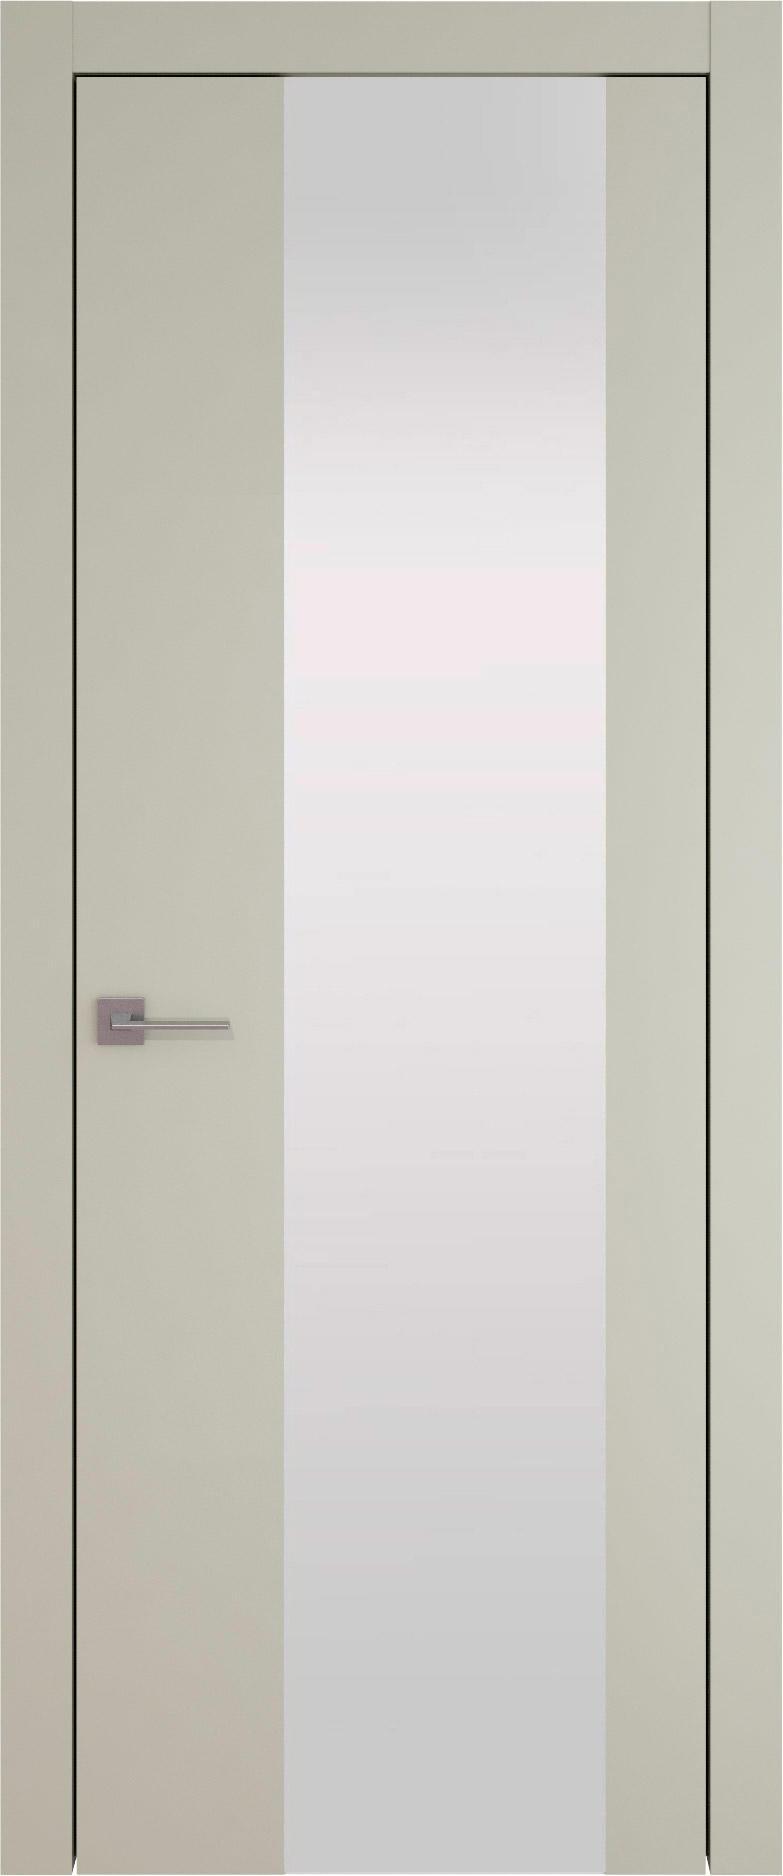 Tivoli Е-1 цвет - Серо-оливковая эмаль (RAL 7032) Со стеклом (ДО)